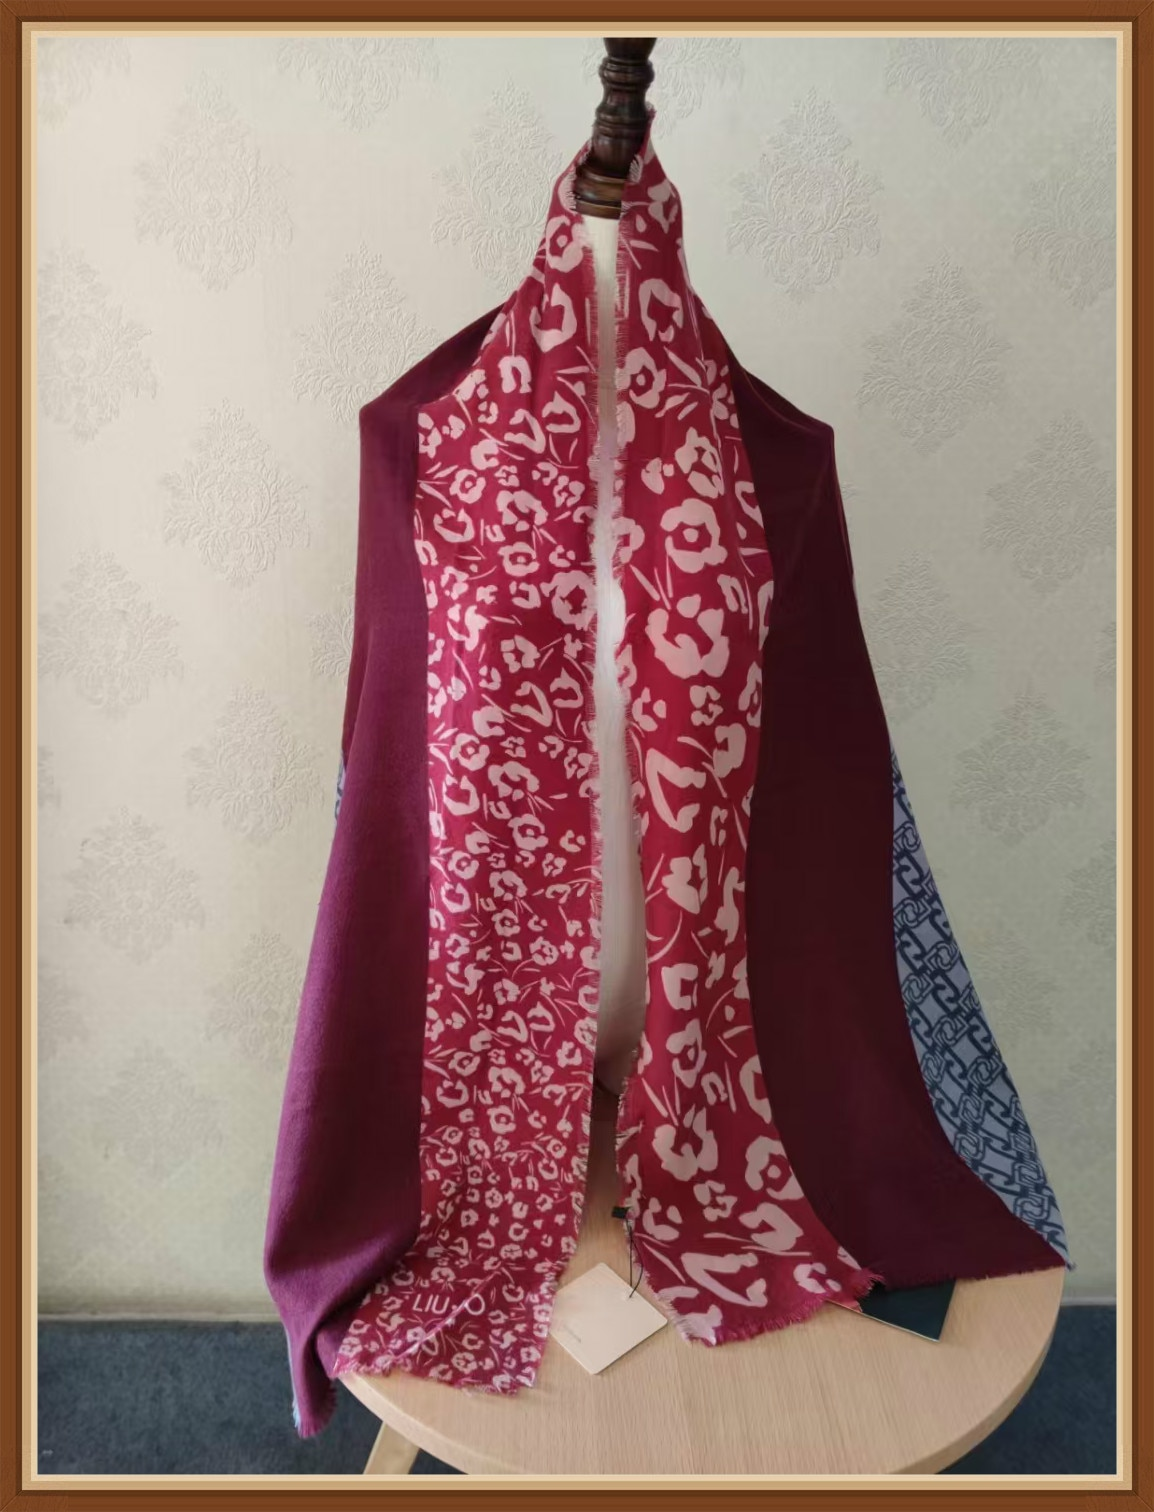 Italian foreign trade ladies winter and winter warm fashion scarf flower design broken flower patchwork long scarf versatile new